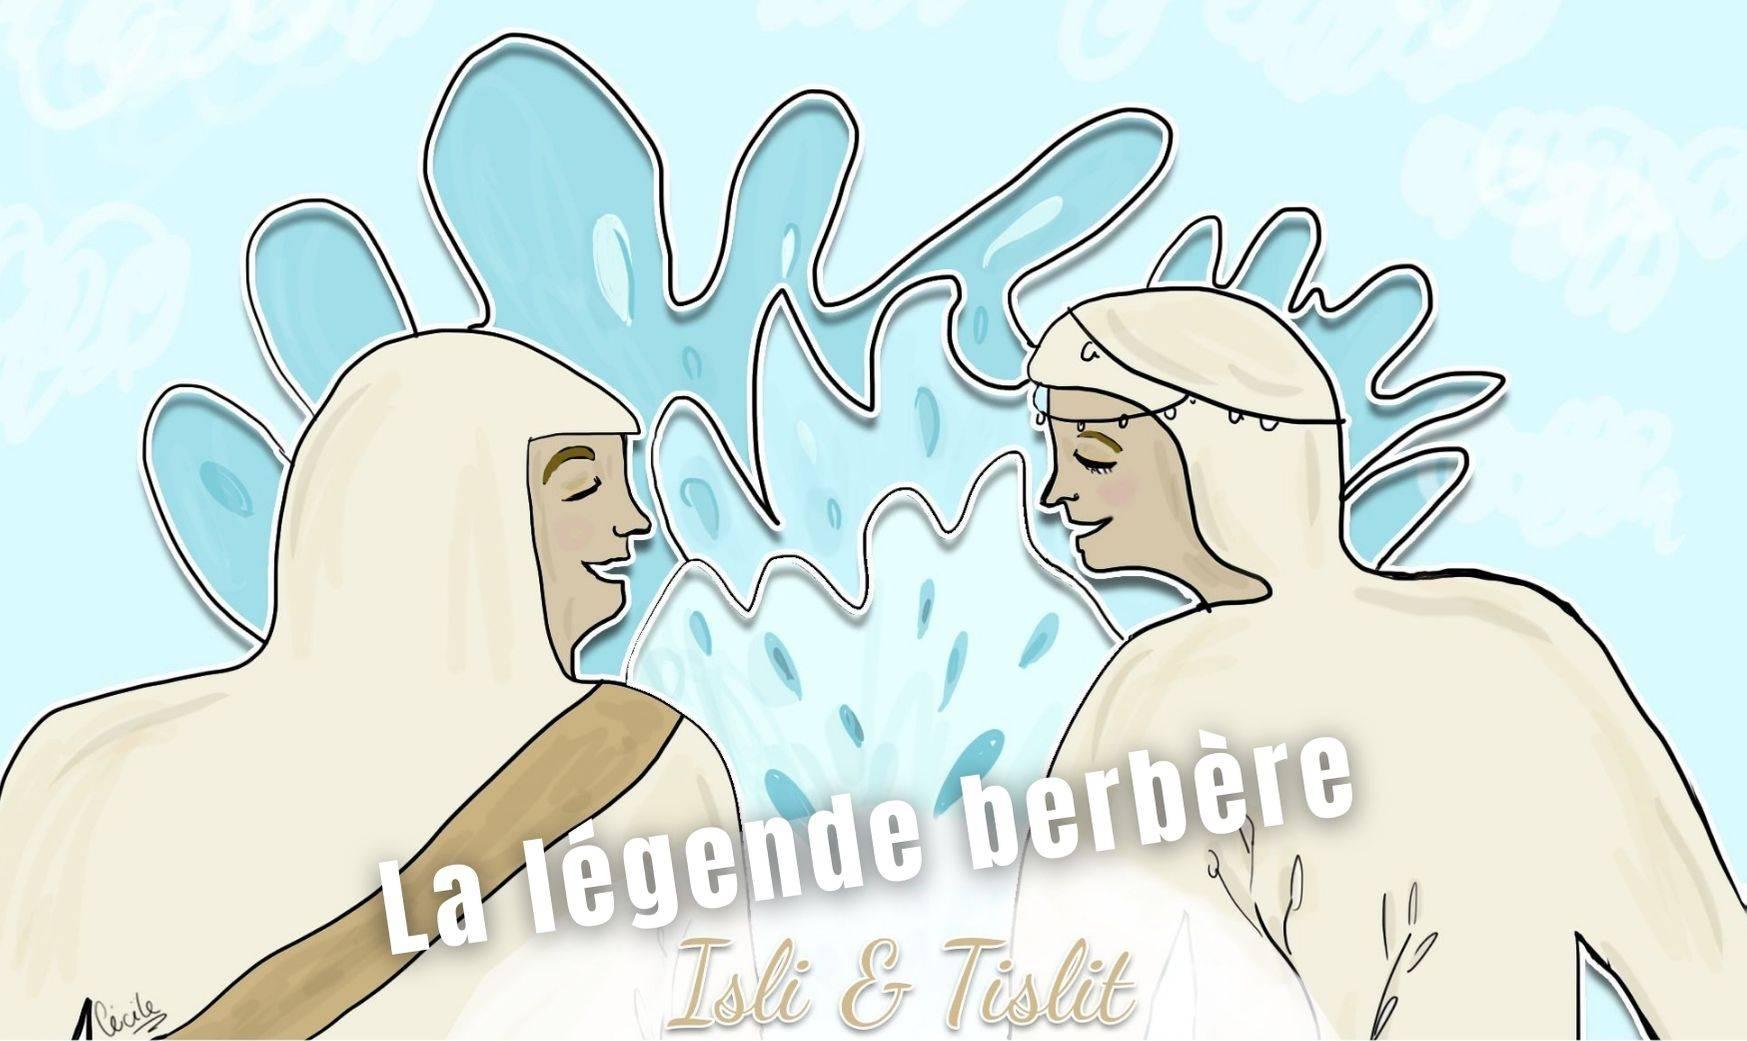 Illustration article légende Isli et Tislit Maroc